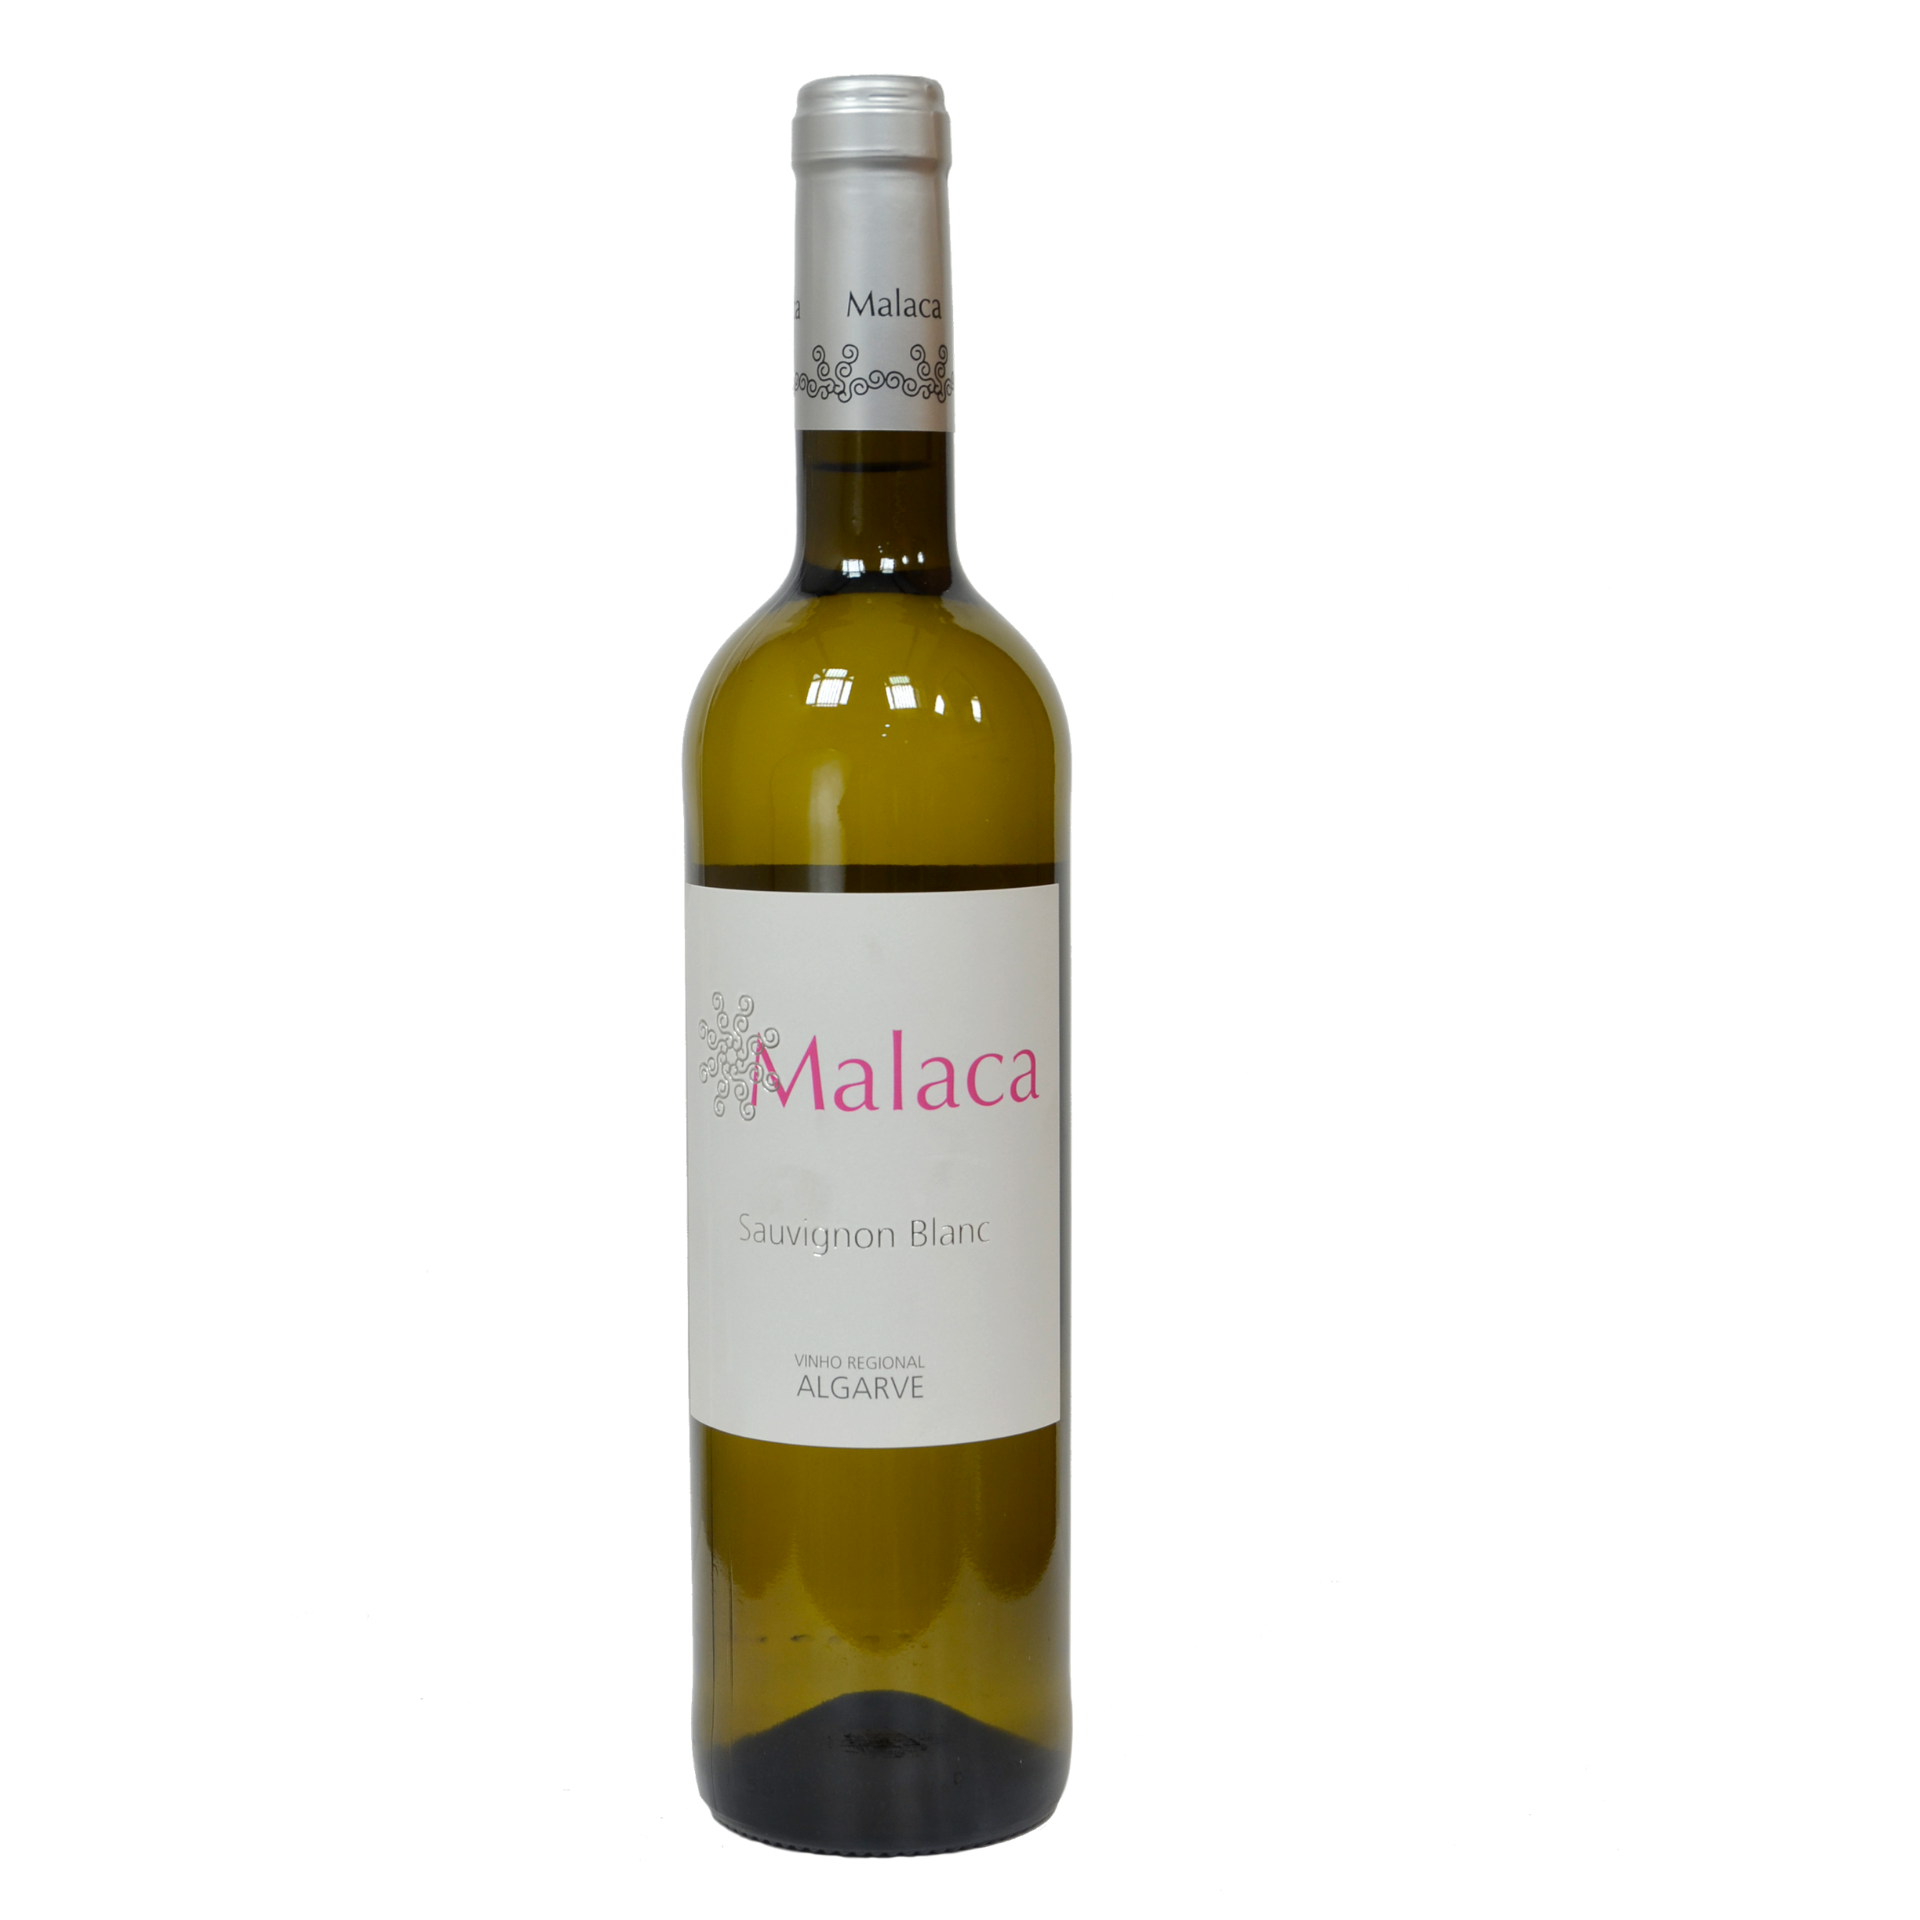 Malaca – Sauvignon Blanc – Branco 2018